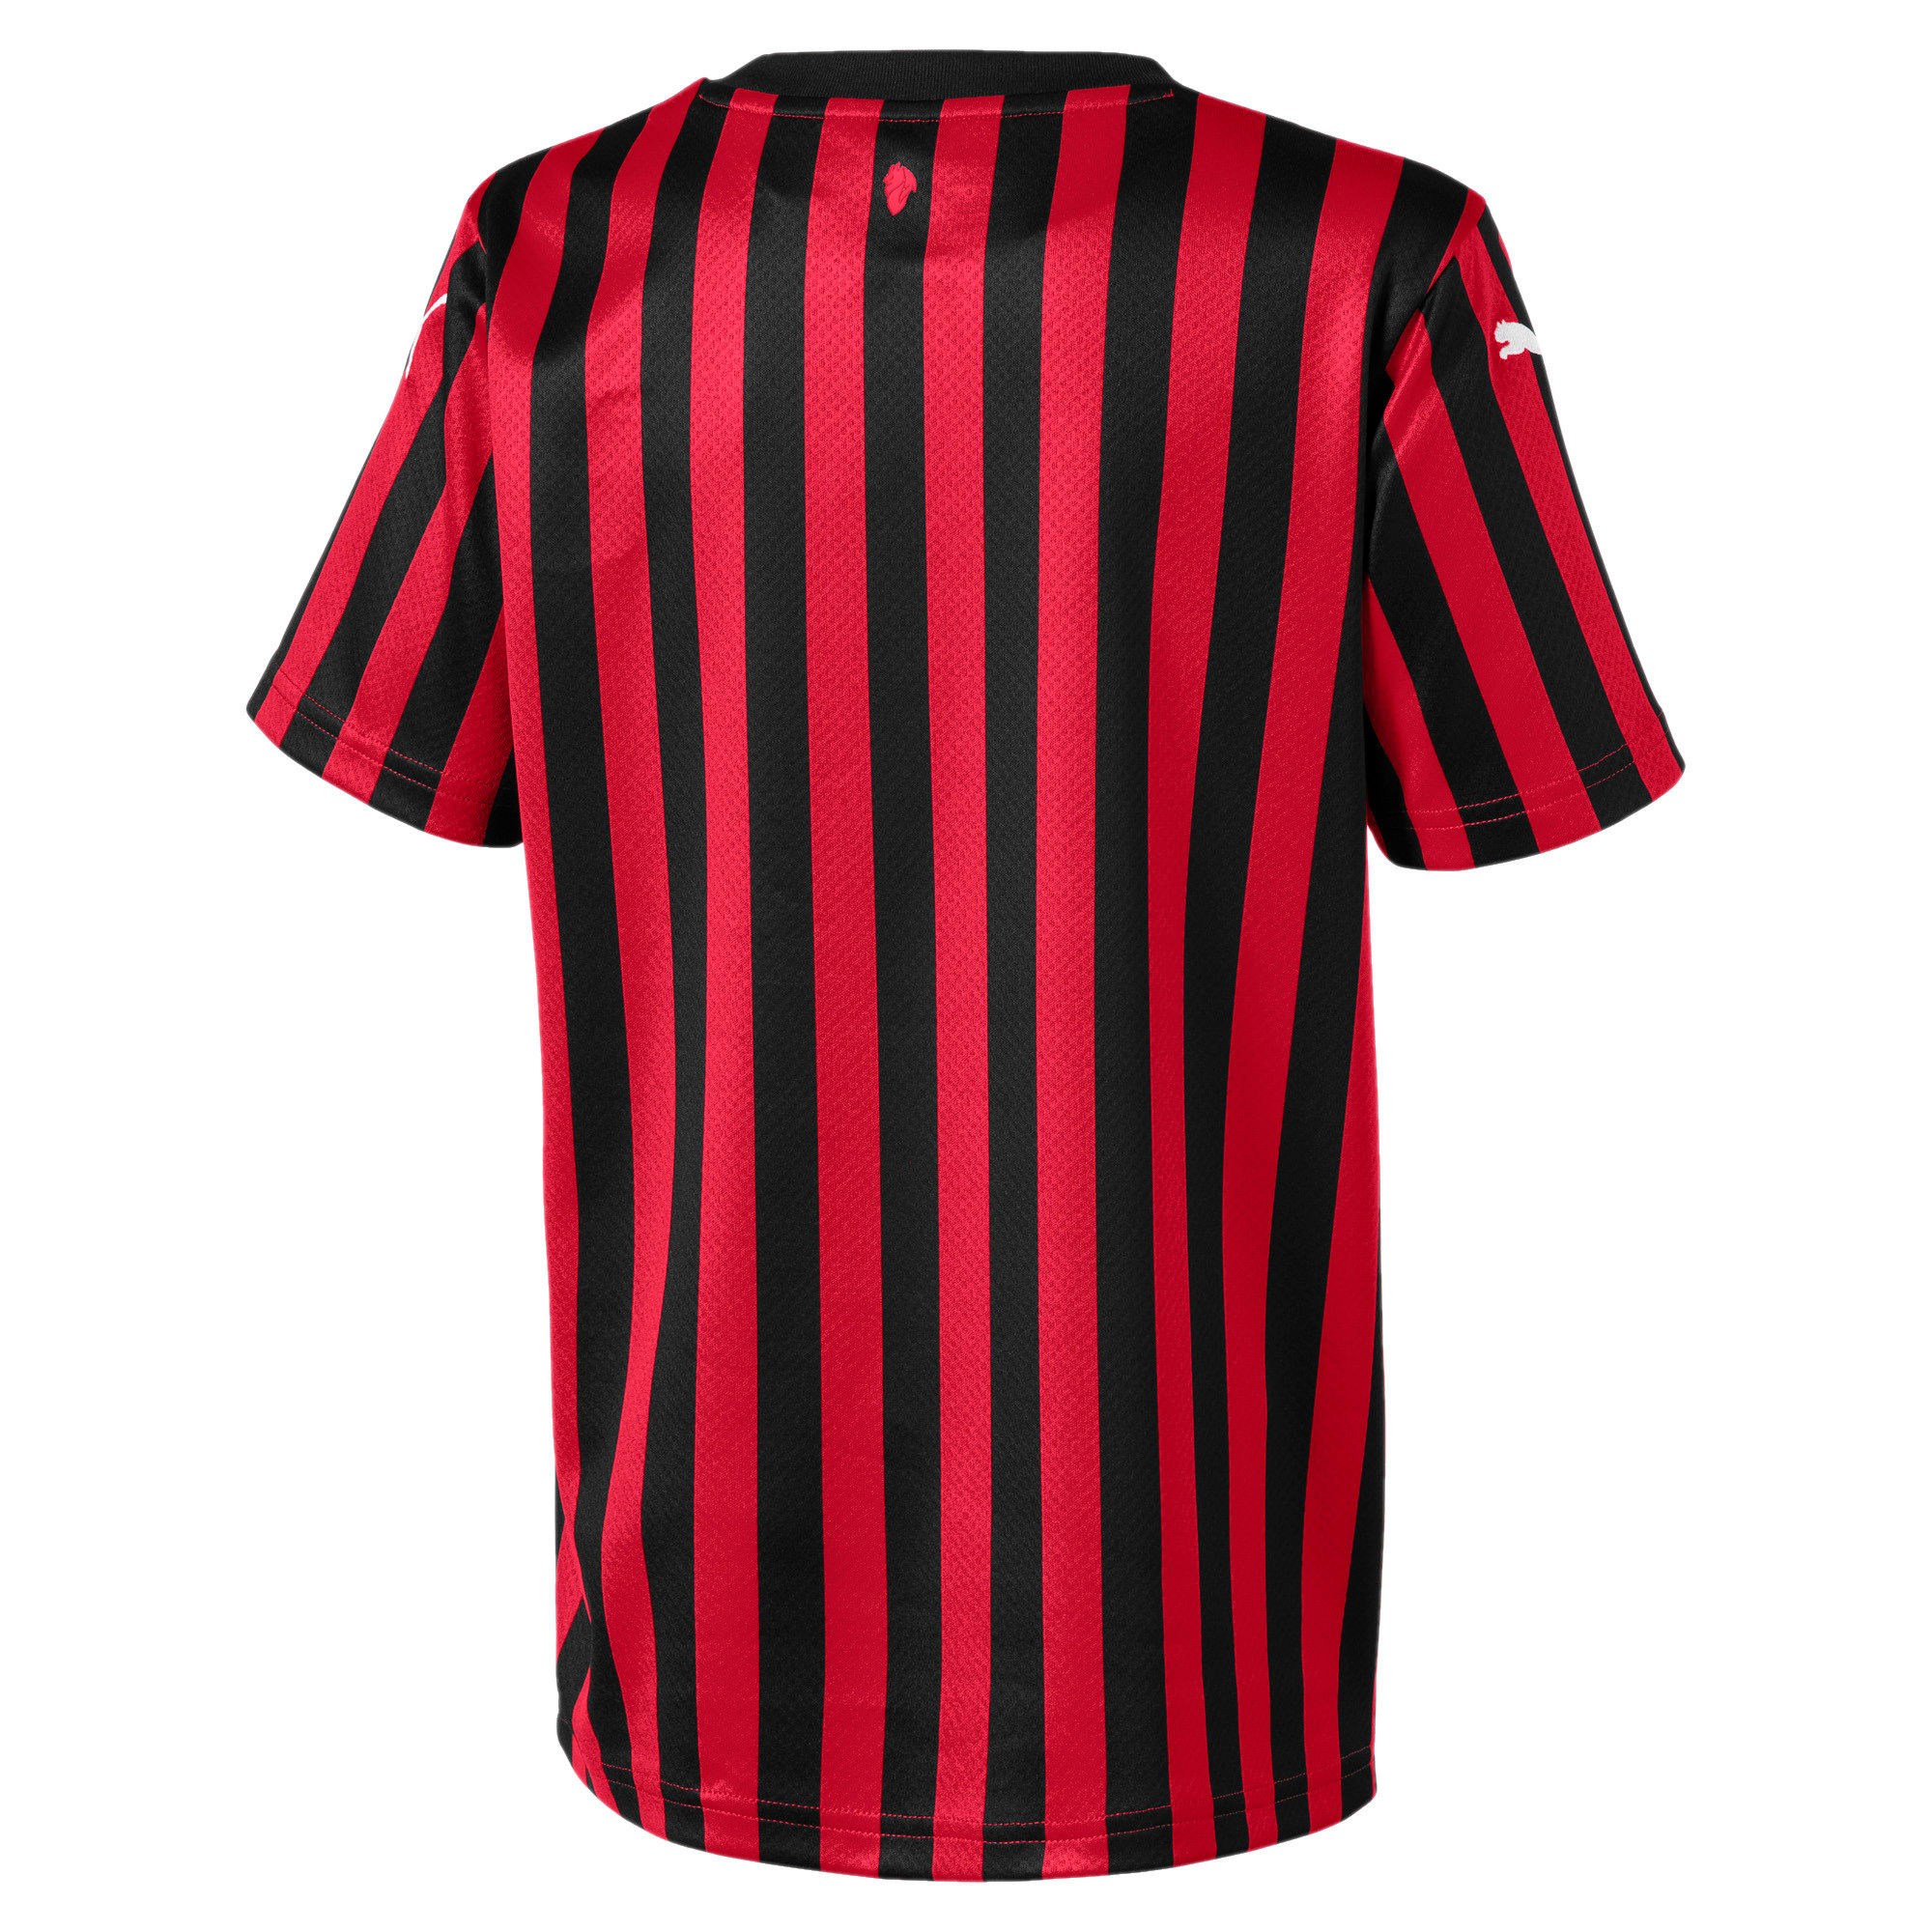 Thumbnail 2 of AC Milan Kid's Replica Jersey, Tango Red -Puma Black, medium